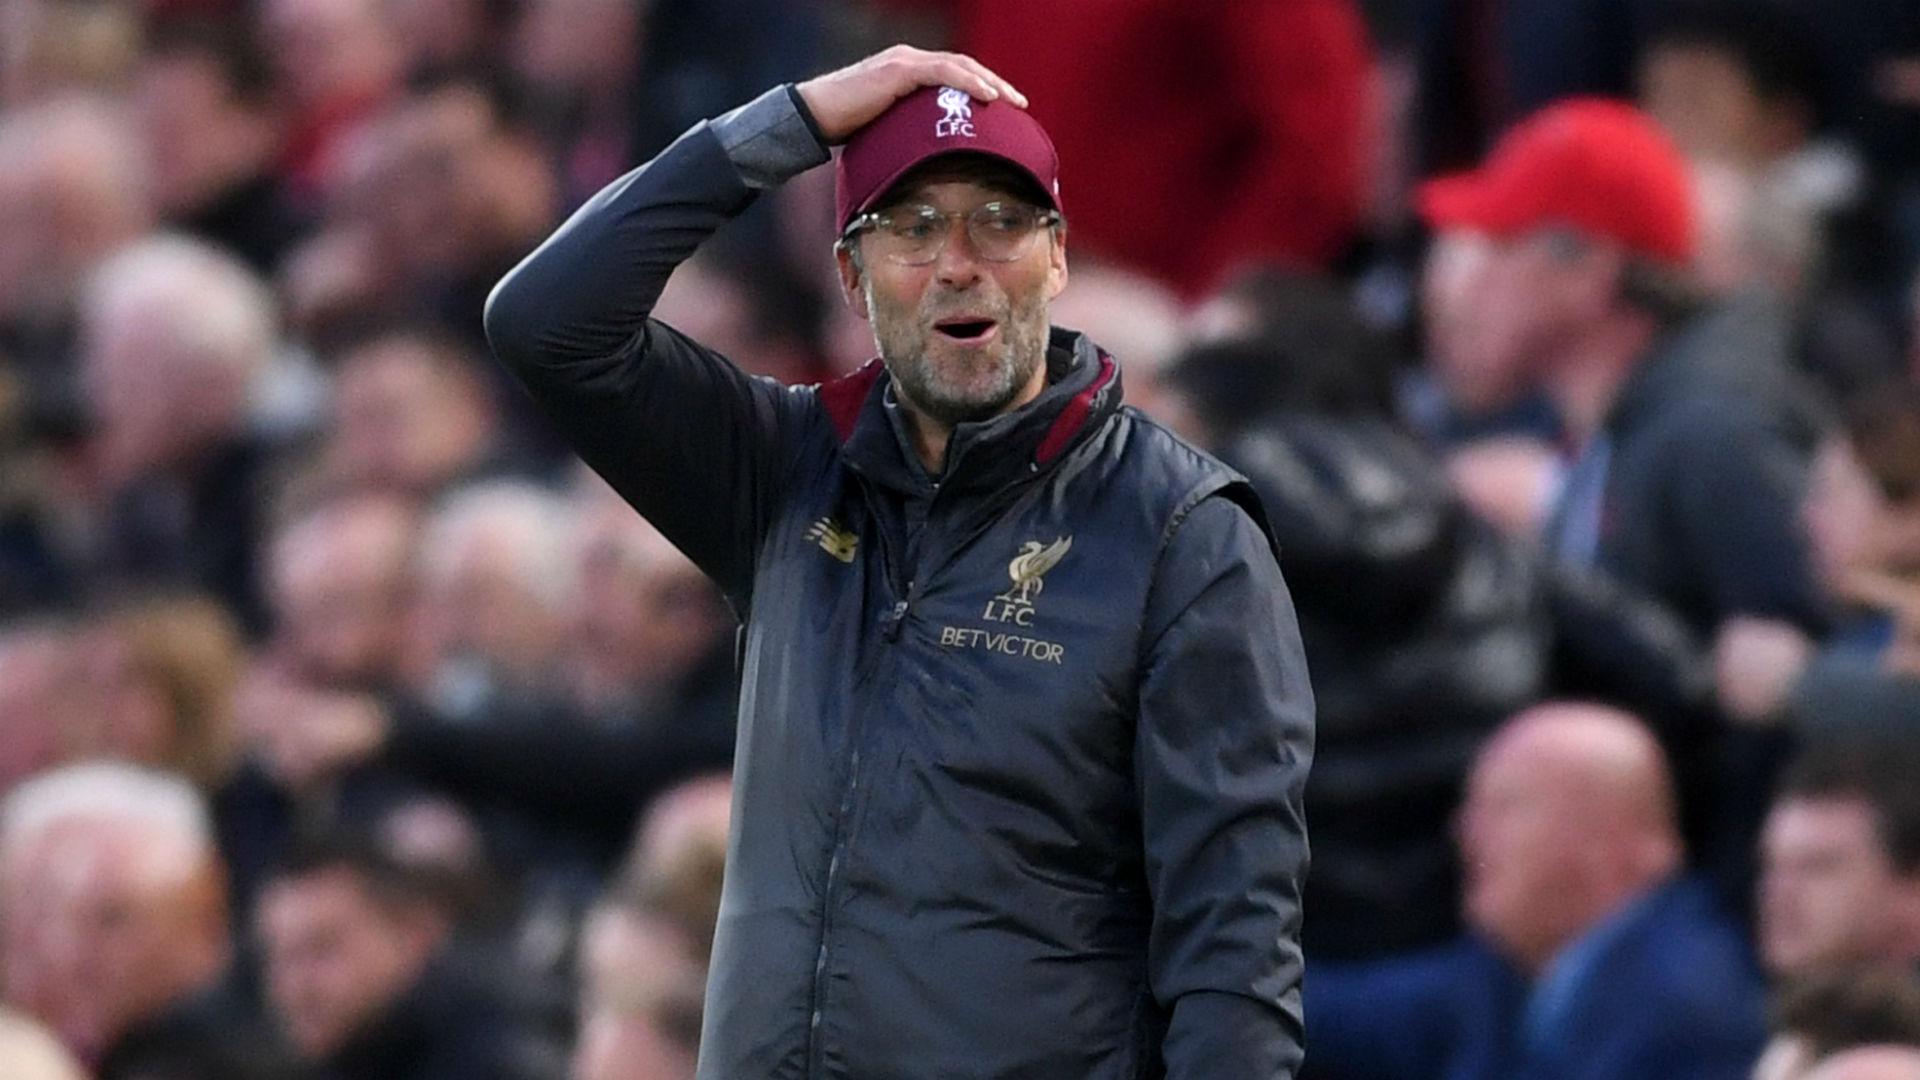 Liverpool's defensive improvement has hurt attack – Klopp